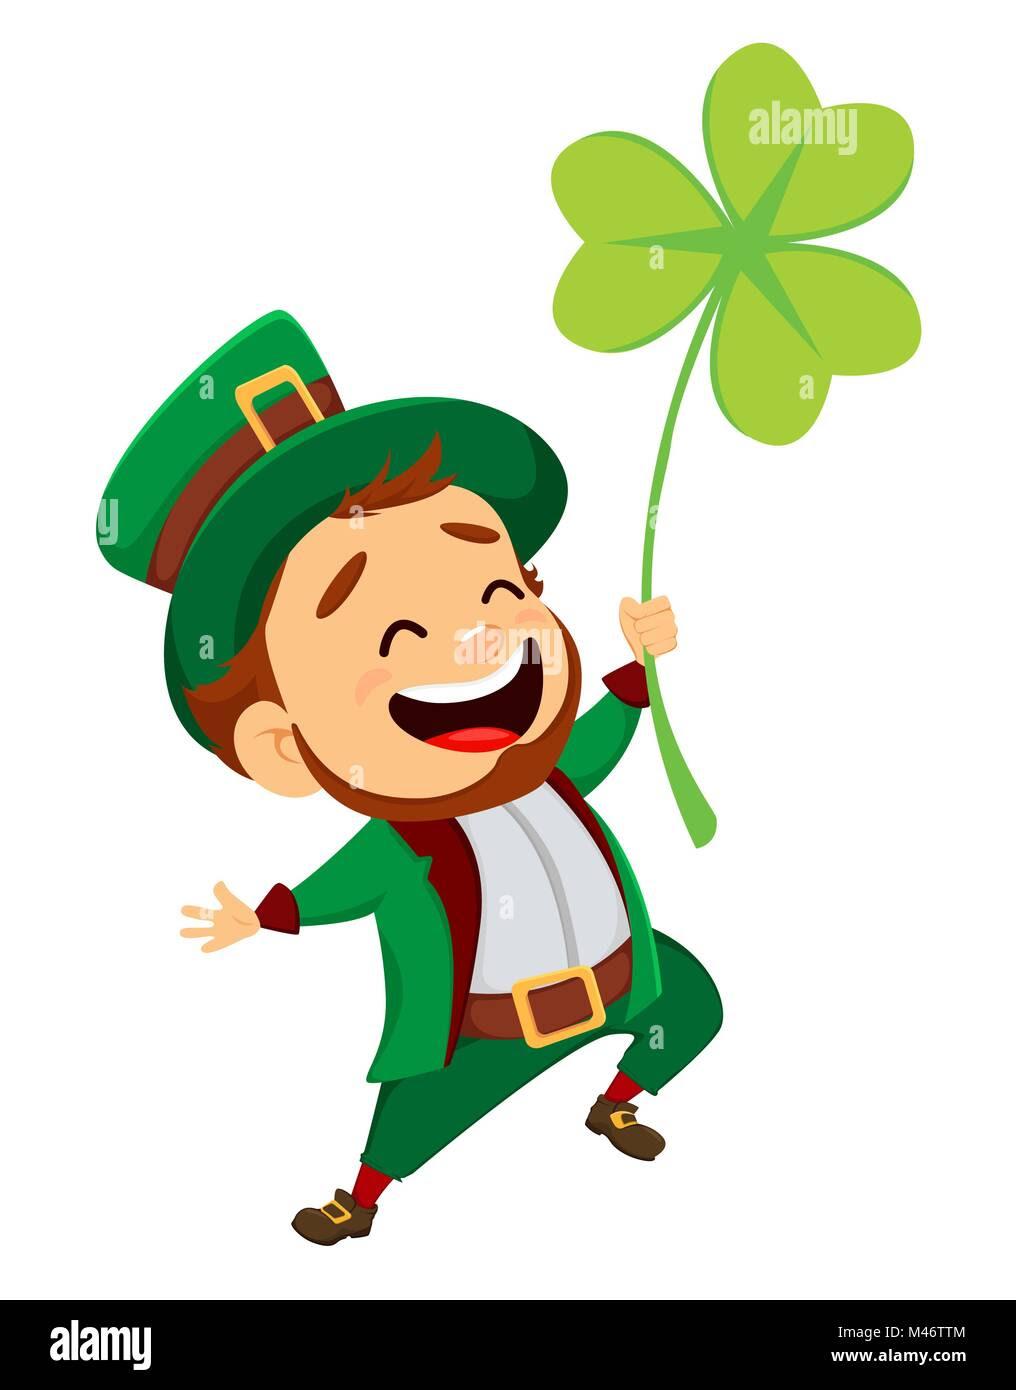 Happy Saint Patricks Day Character With Green Hat Cartoon Funny